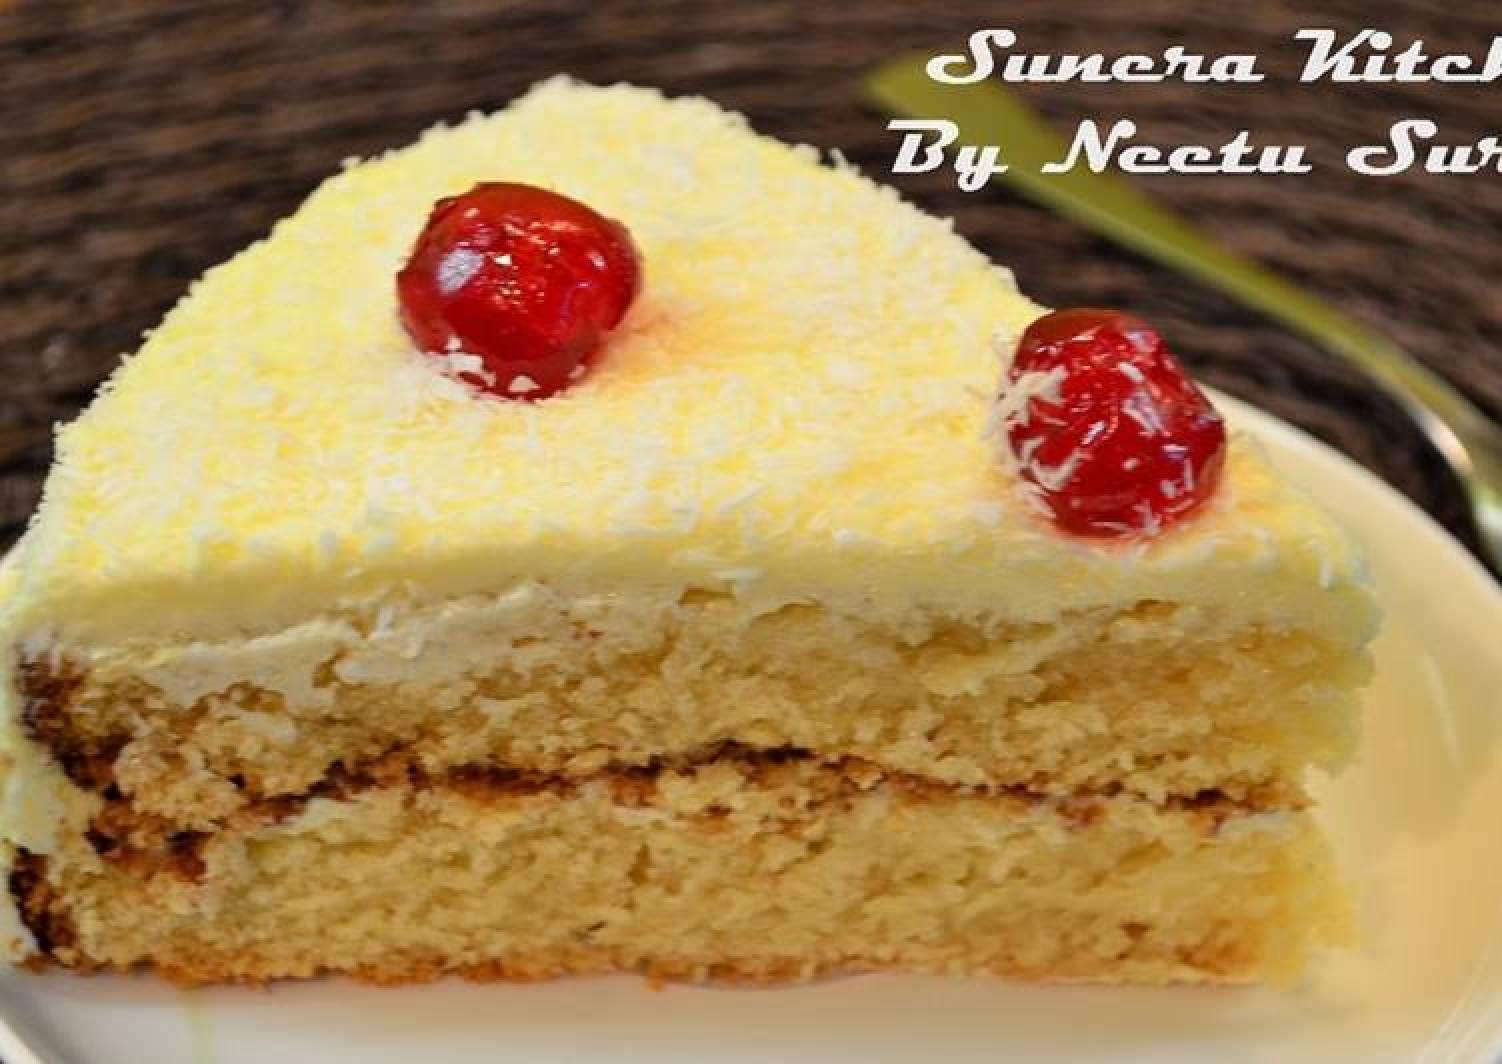 Rasmalai Sponge Cake / Eggless Sponge Cake